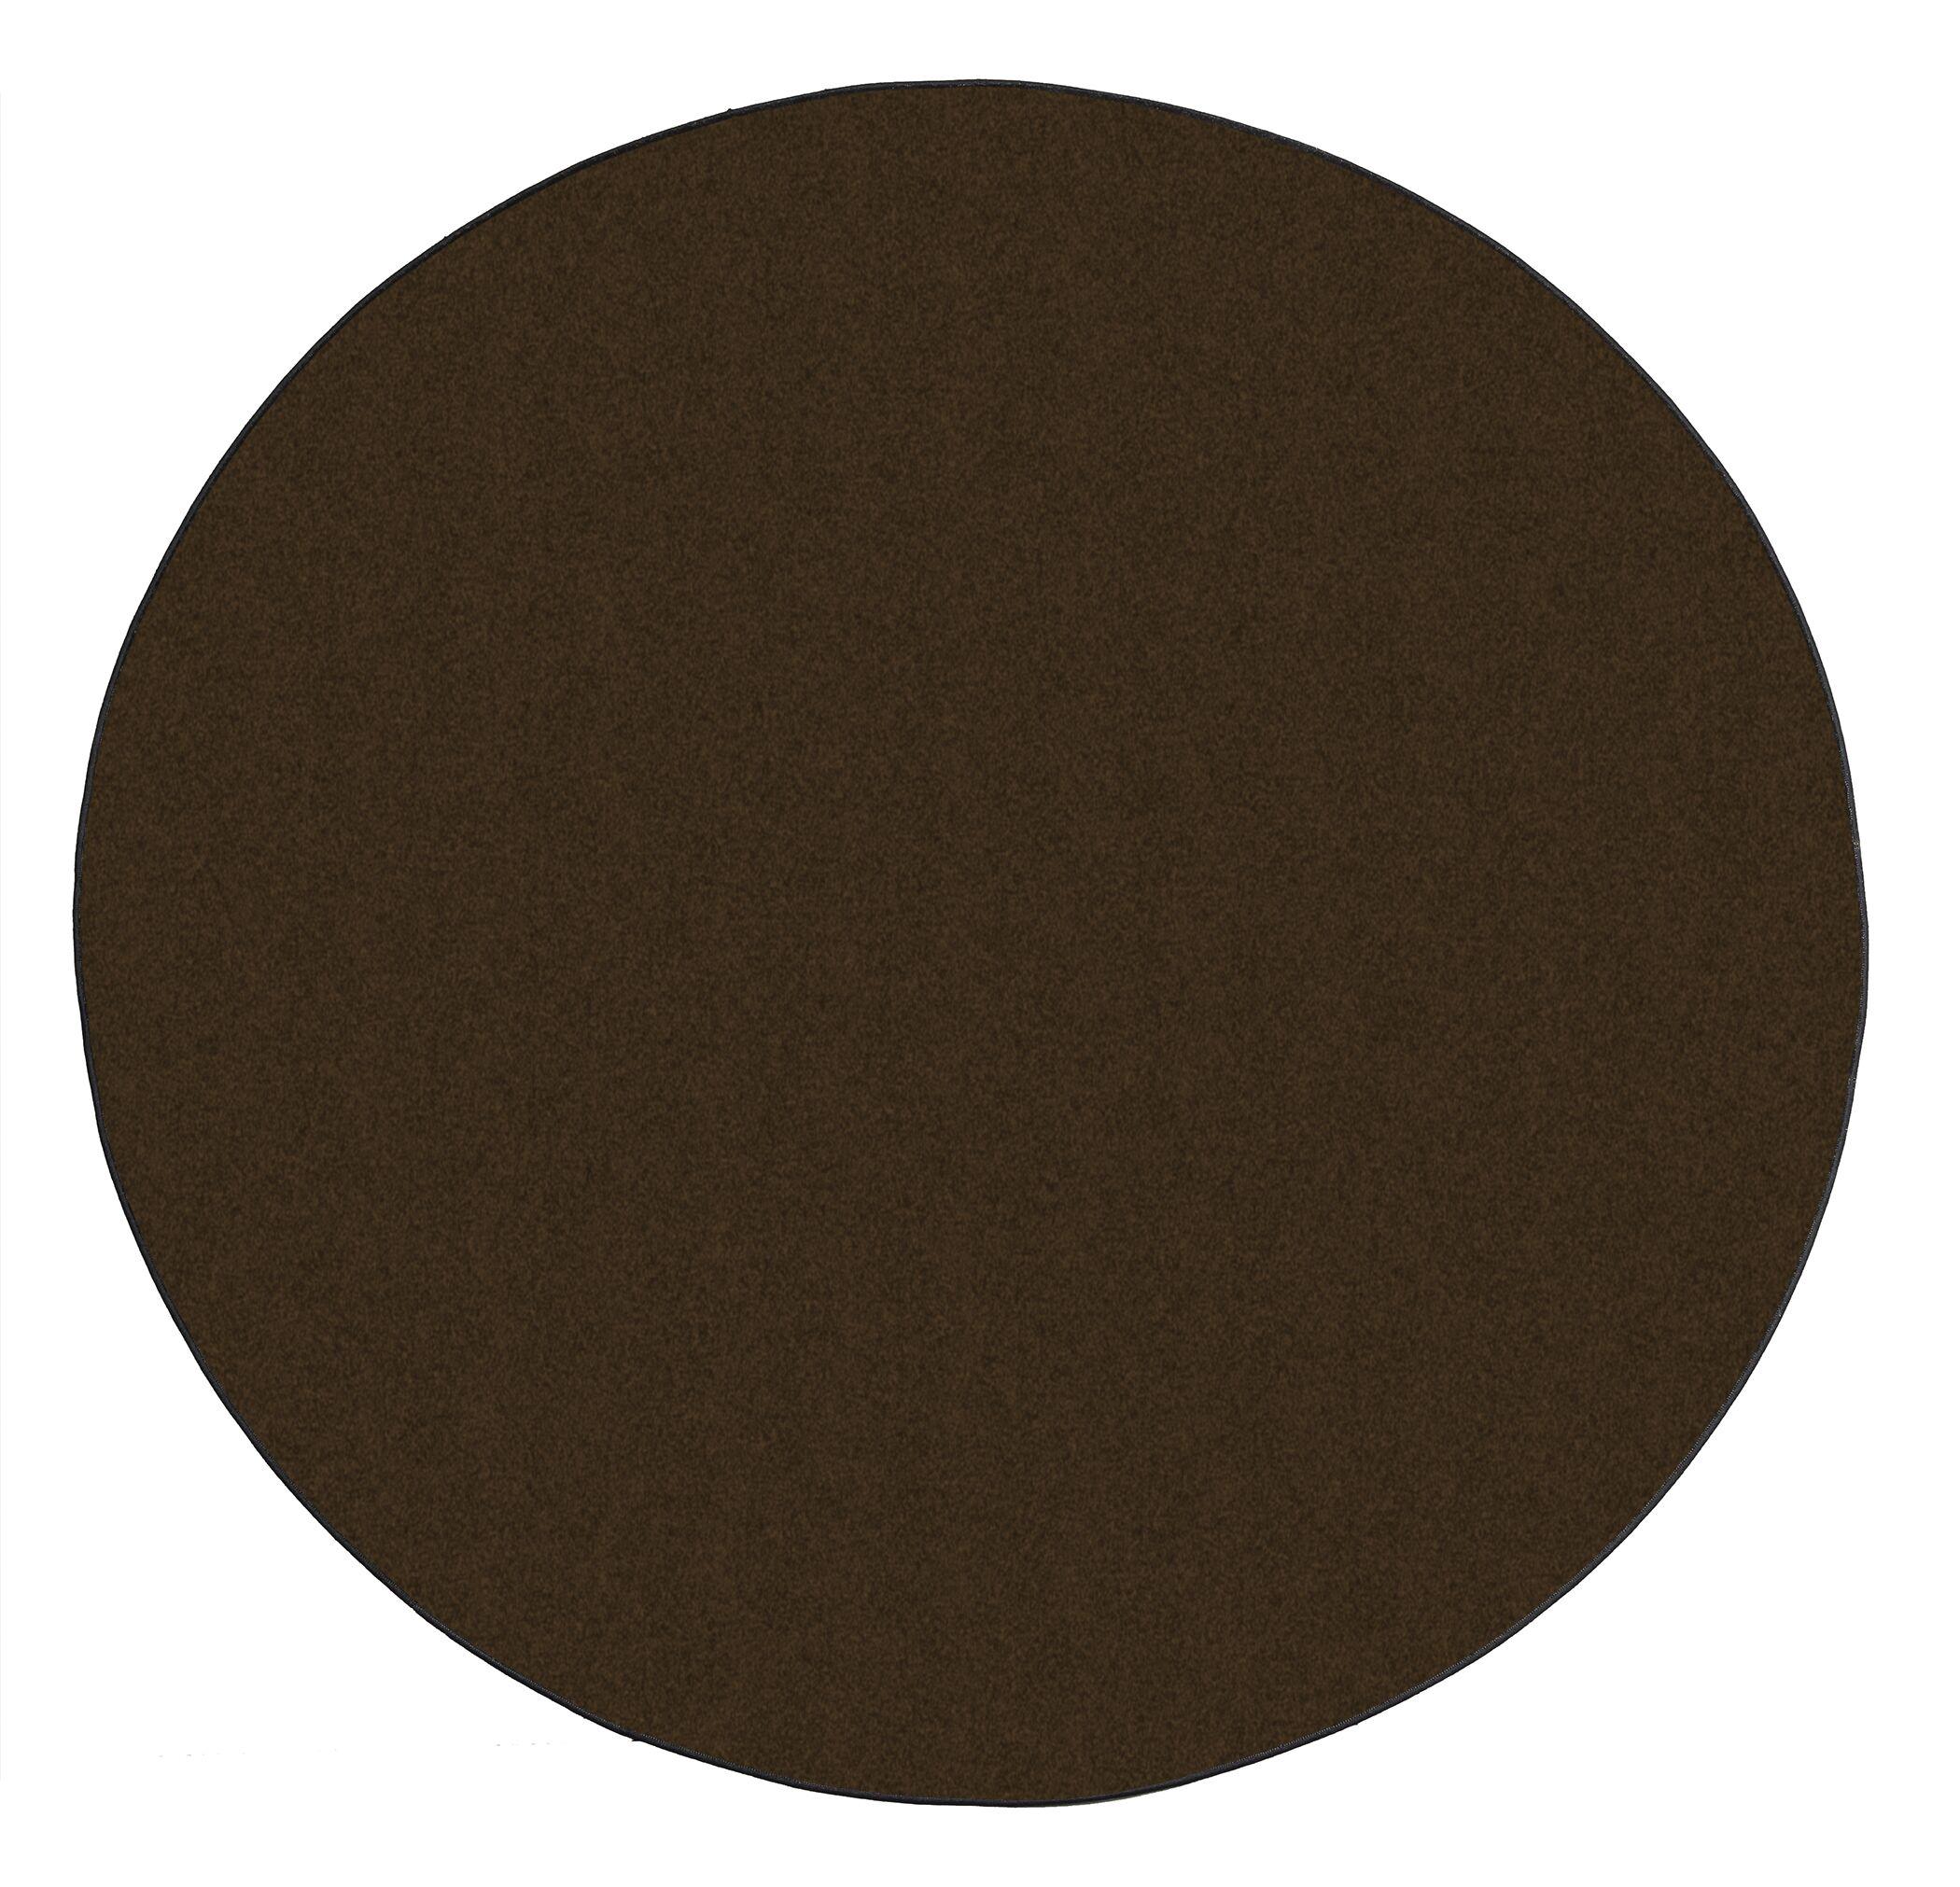 Americolors Chocolate Area Rug Rug Size: Round 6'